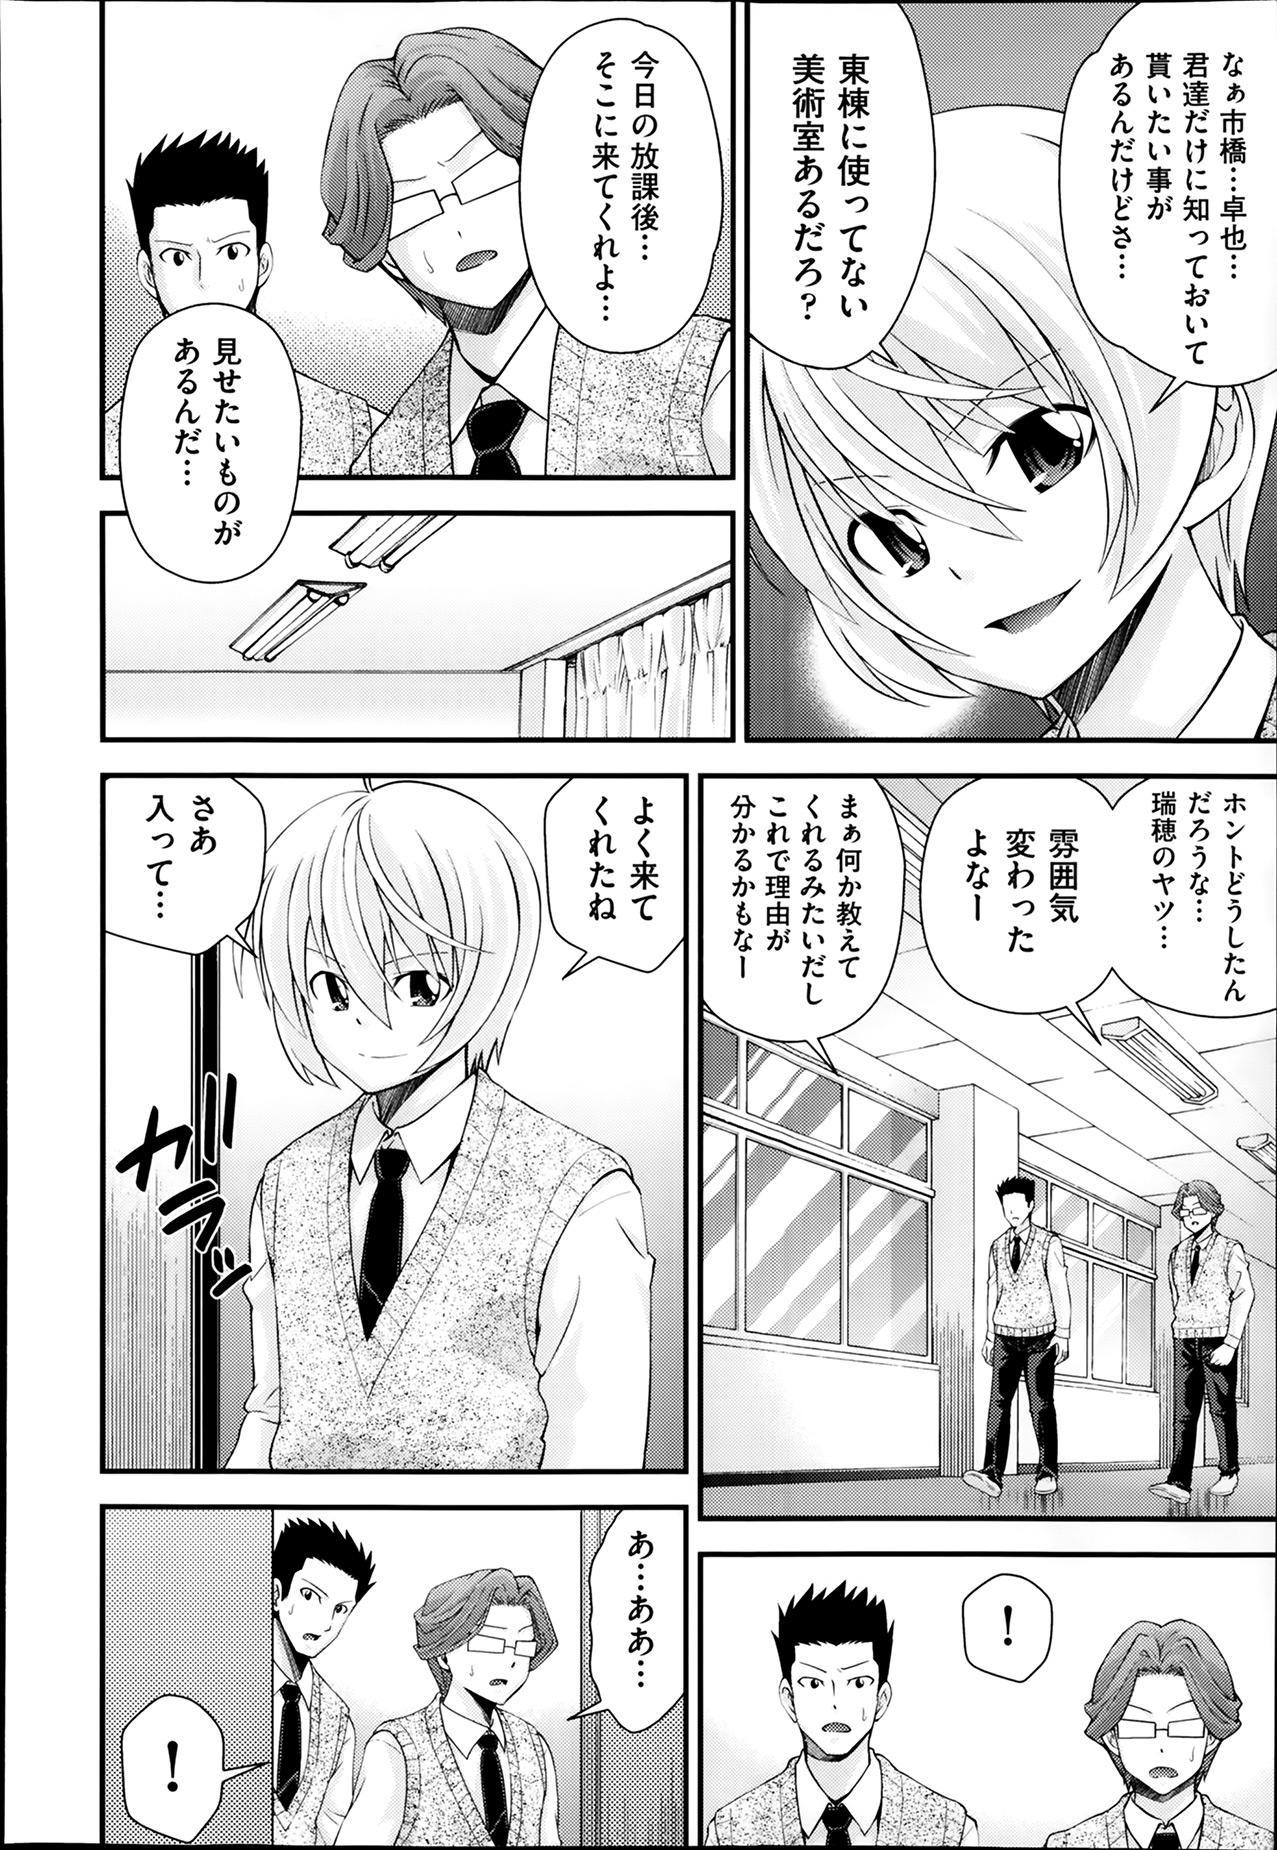 Kyoudai Replace 75